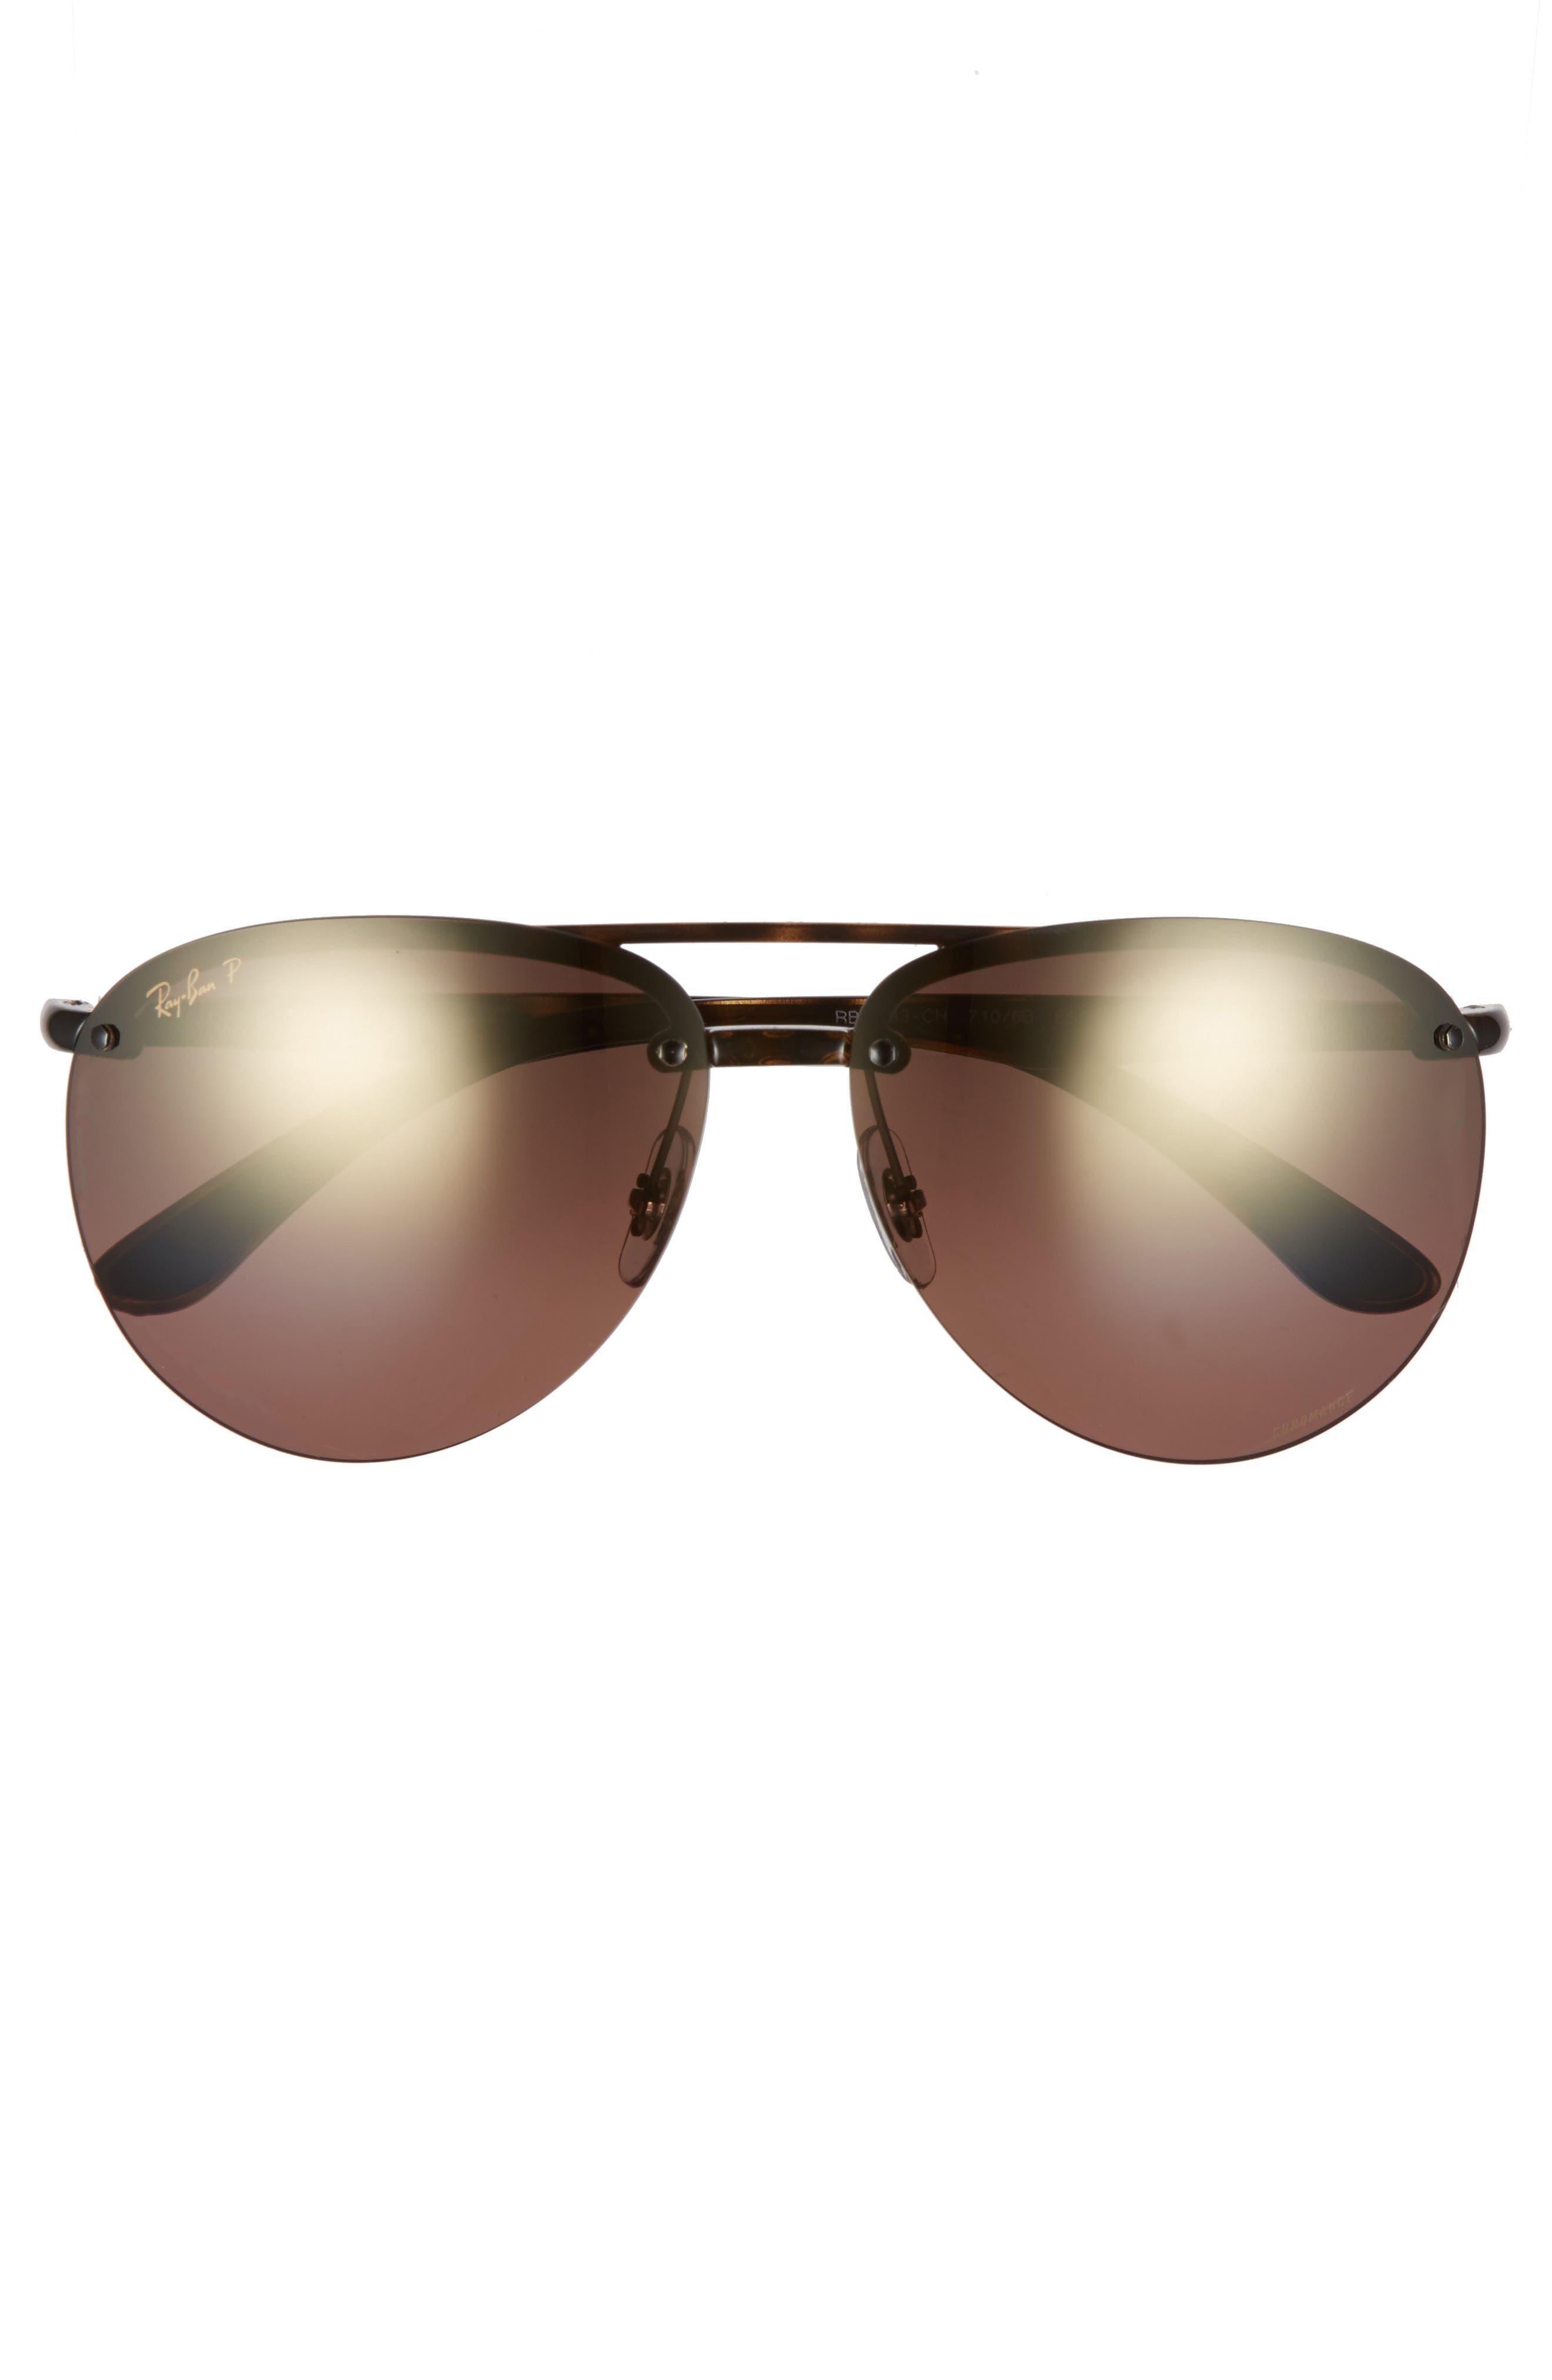 65mm Gradient Aviator Sunglasses,                             Alternate thumbnail 3, color,                             200